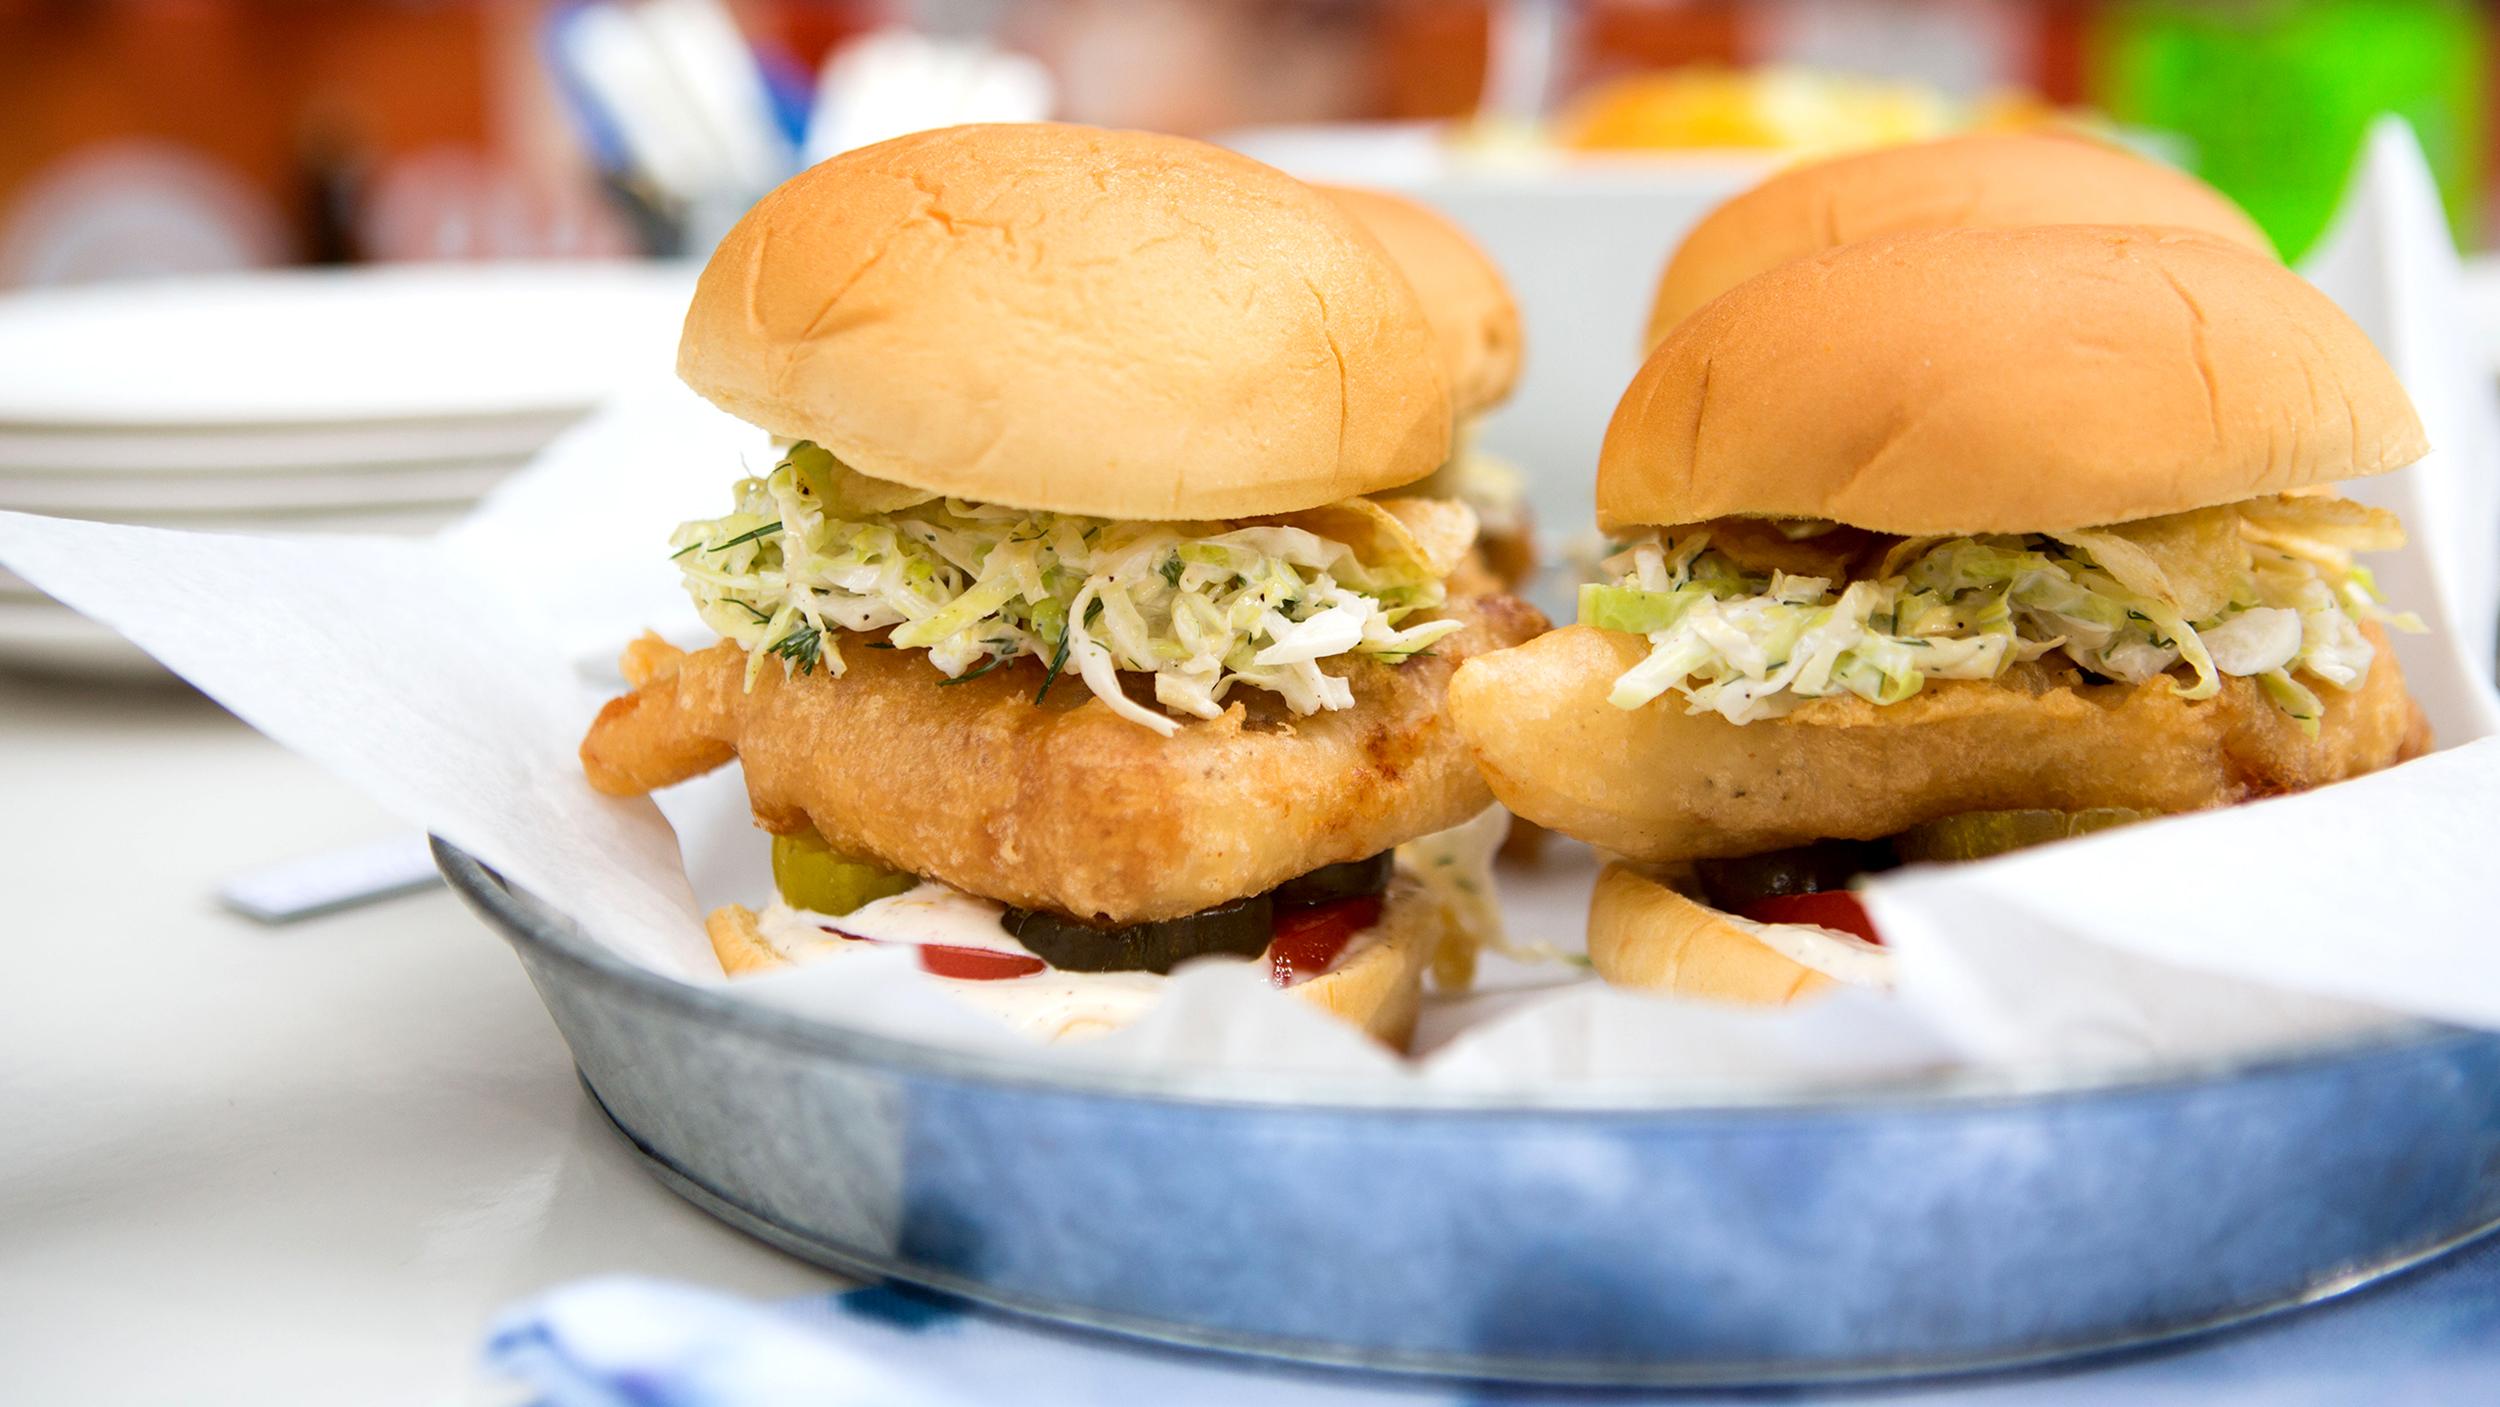 Martha stewart 39 s fish fry recipes fried fish sandwiches for Fish burger recipe